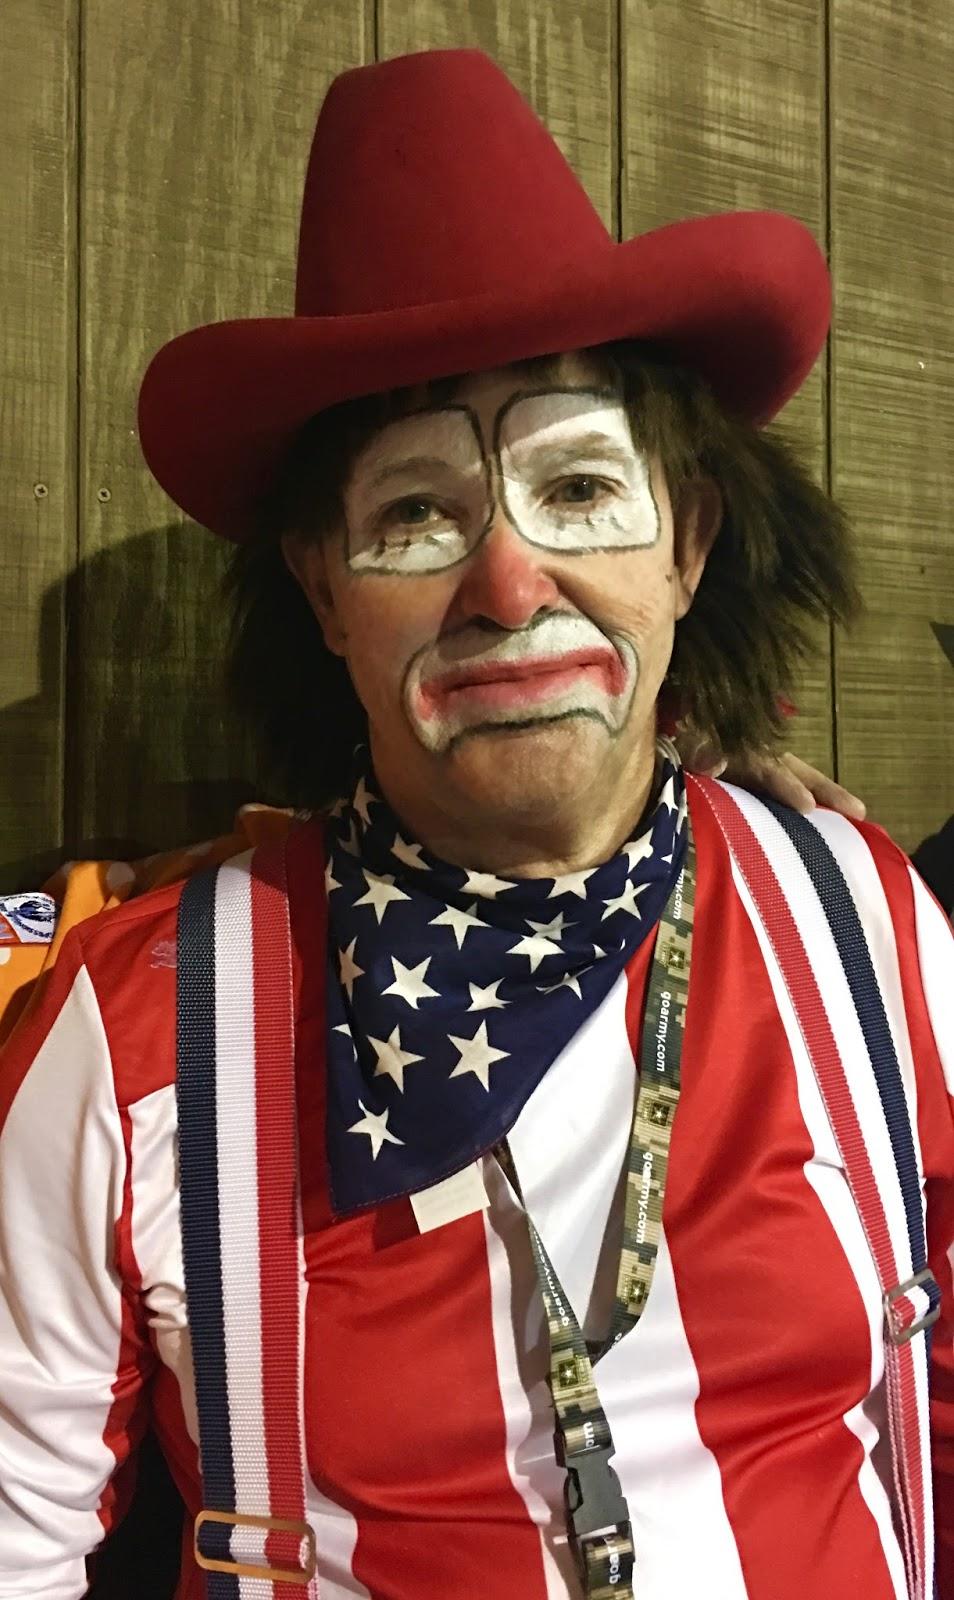 Chasing Santa Fe Rodeo Clown Portraits